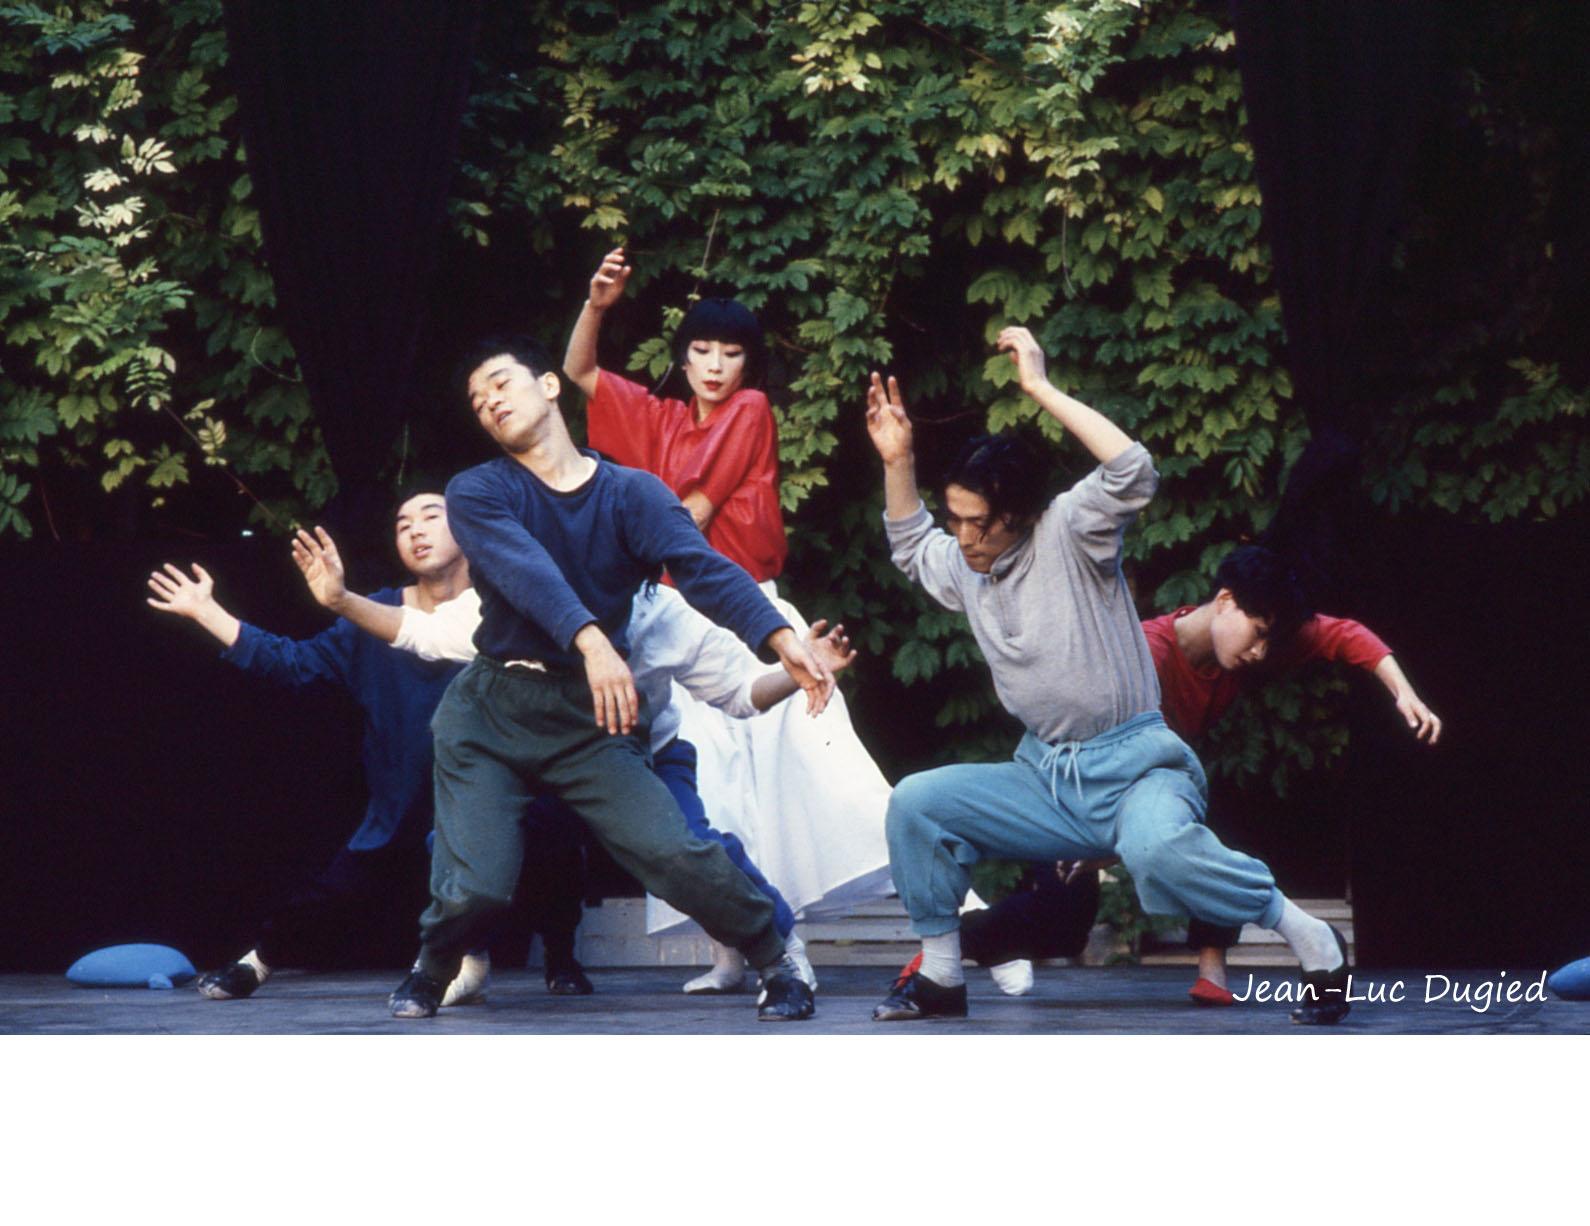 15 Teshigawara Saburo - lecture démonstration à Aix - 1988